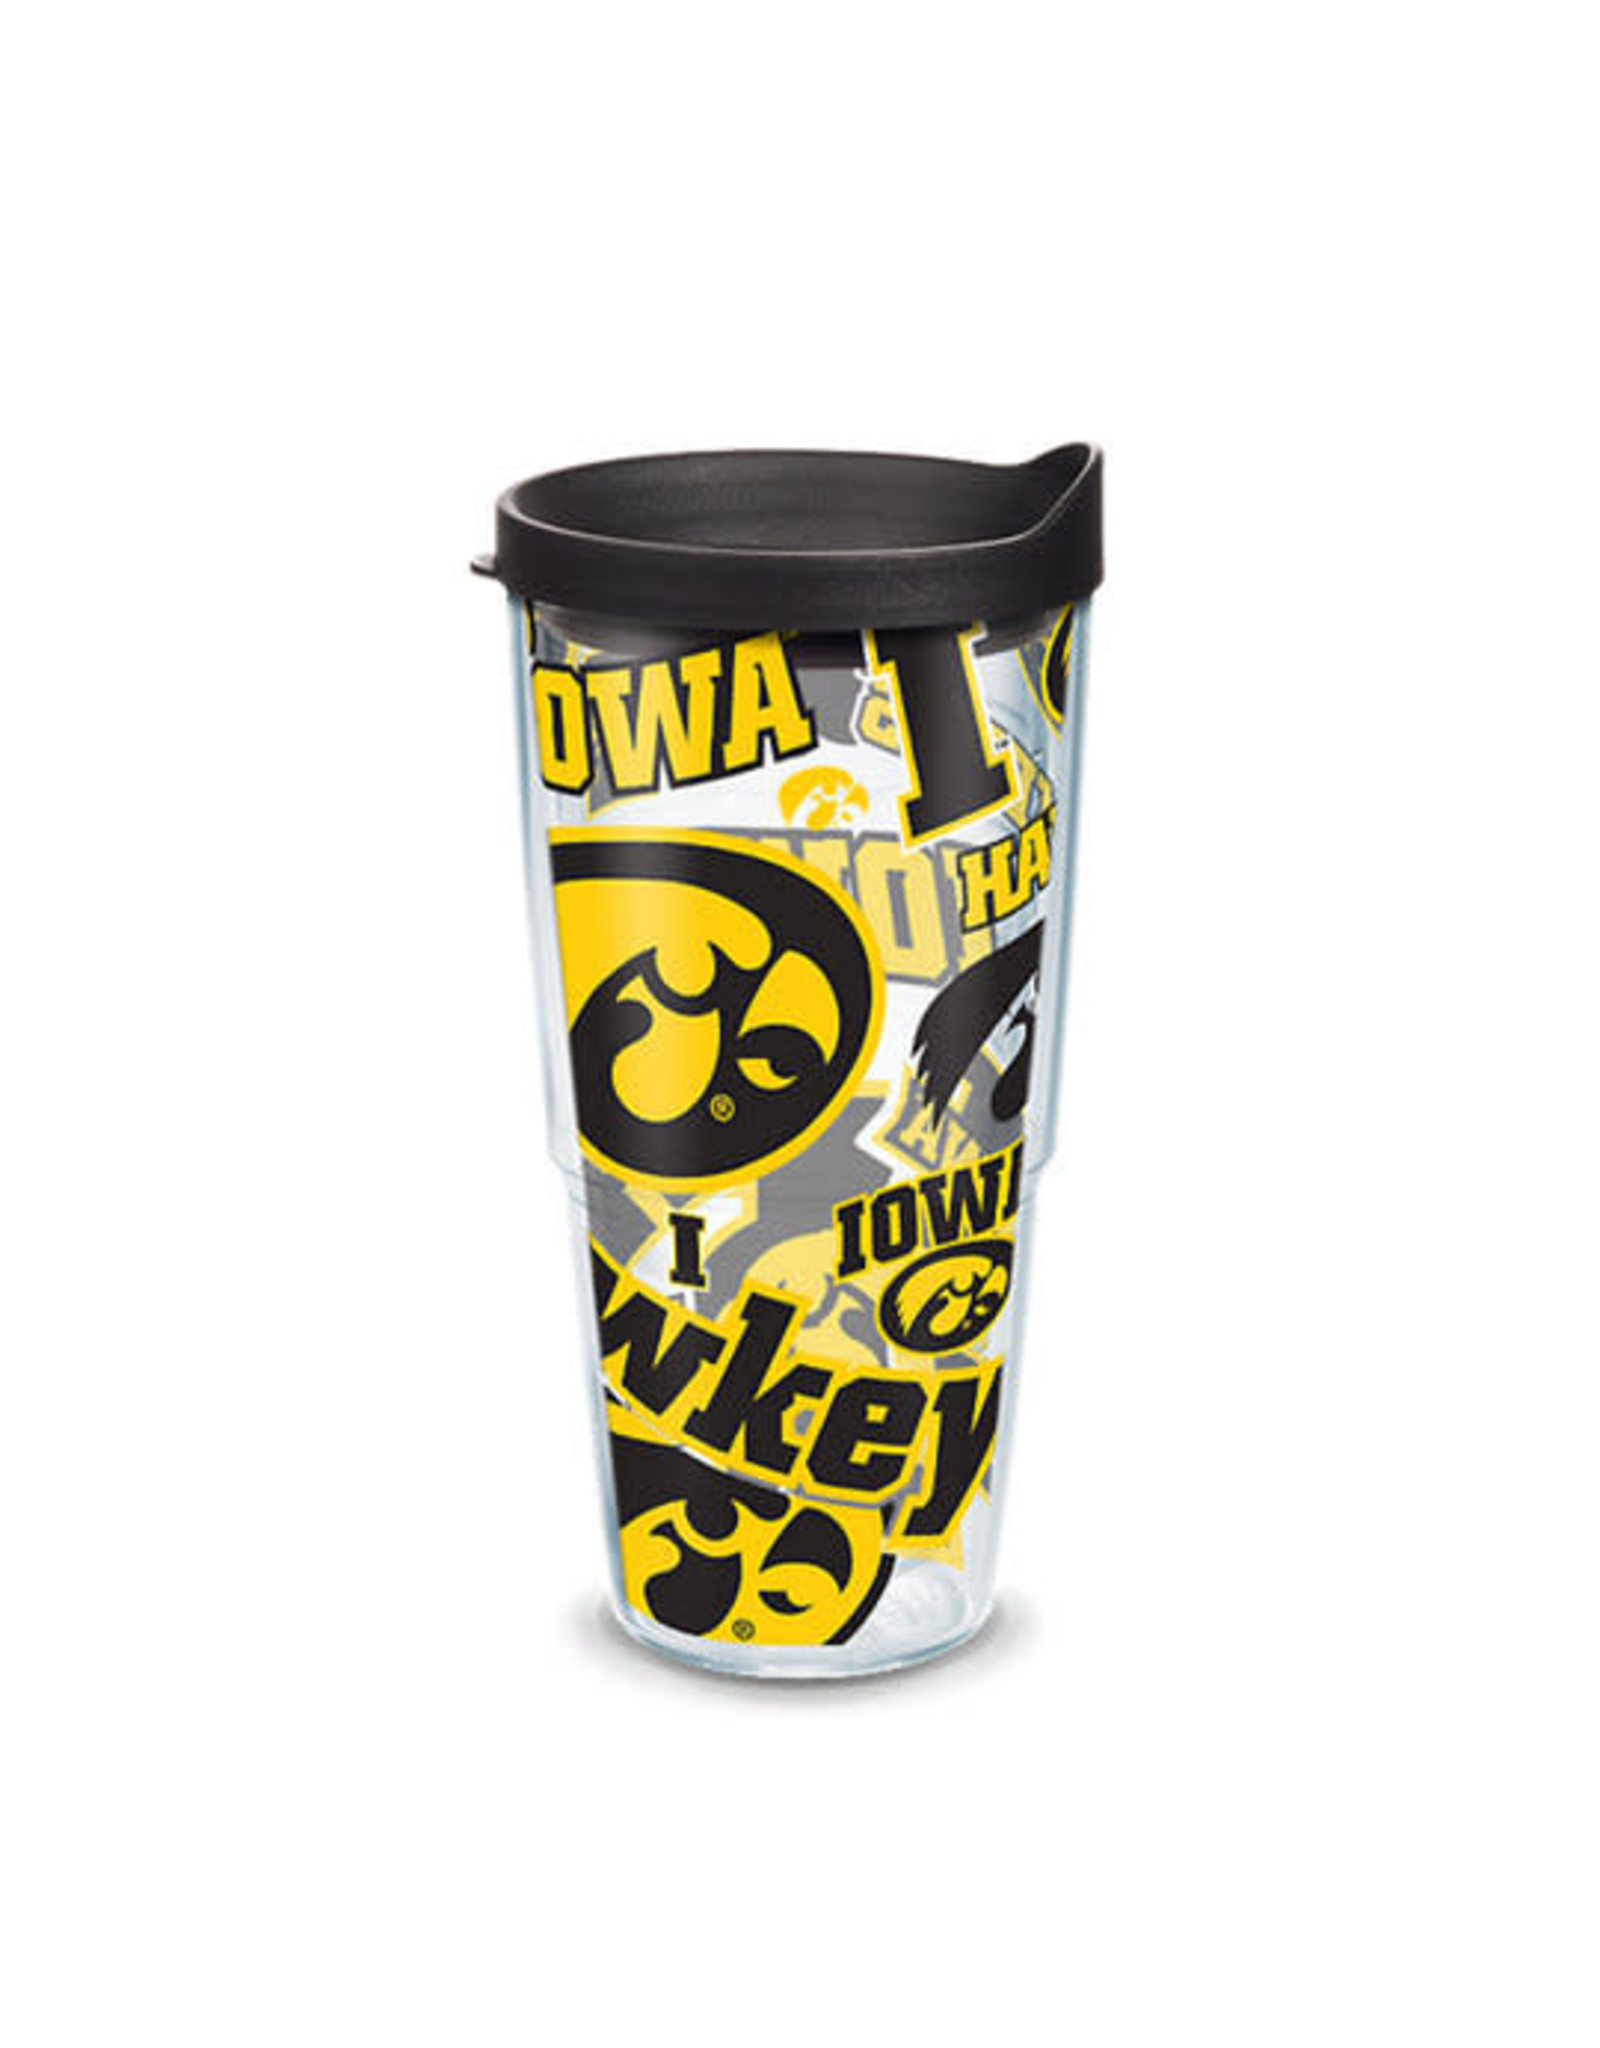 Tervis Tumbler 24oz/Lid Iowa All Over